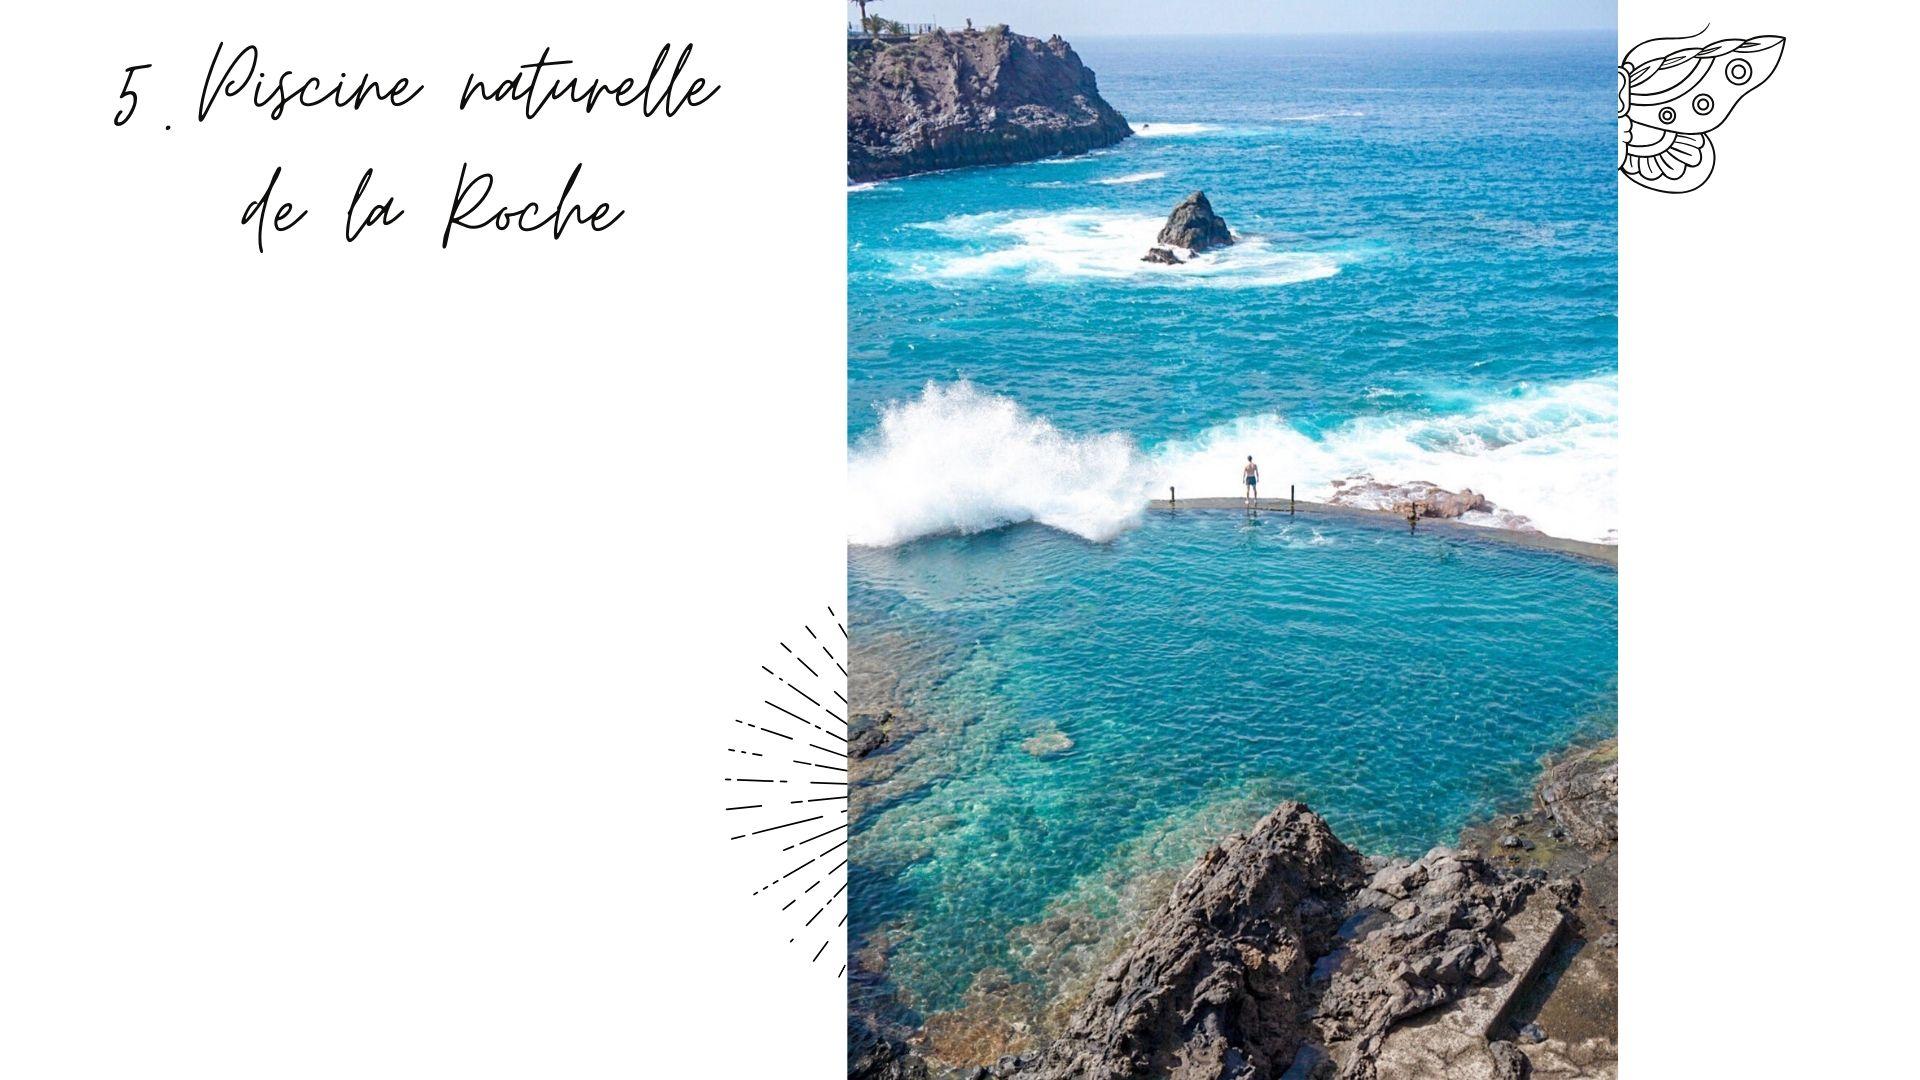 piscine naturelle de la roche tenerife